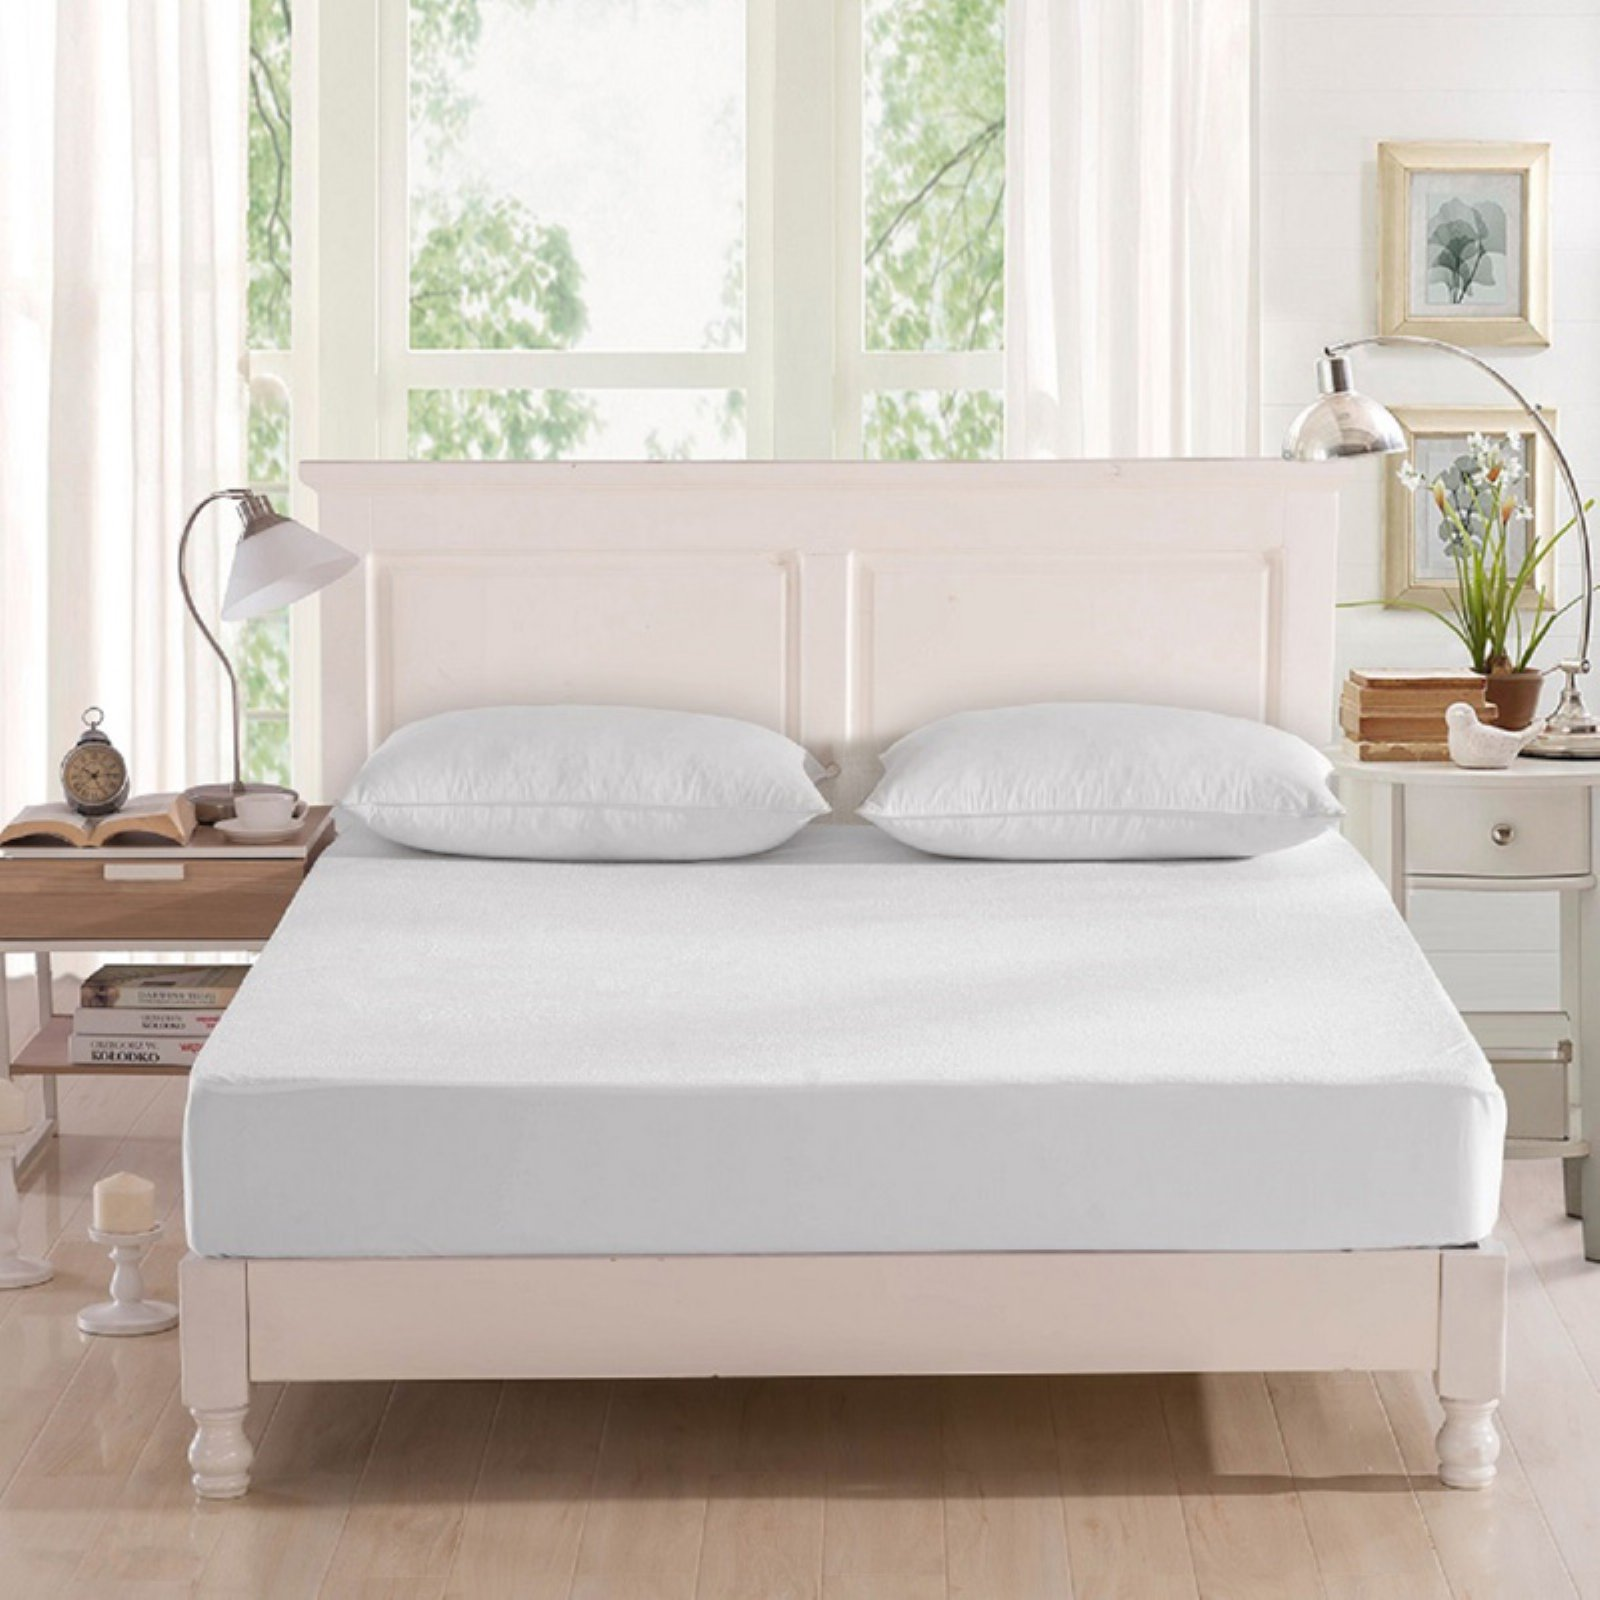 Dream Signature Collection Bamboo Viscose Terry Mattress Protector Size Queen Mattress Protector Mattress King Pillows